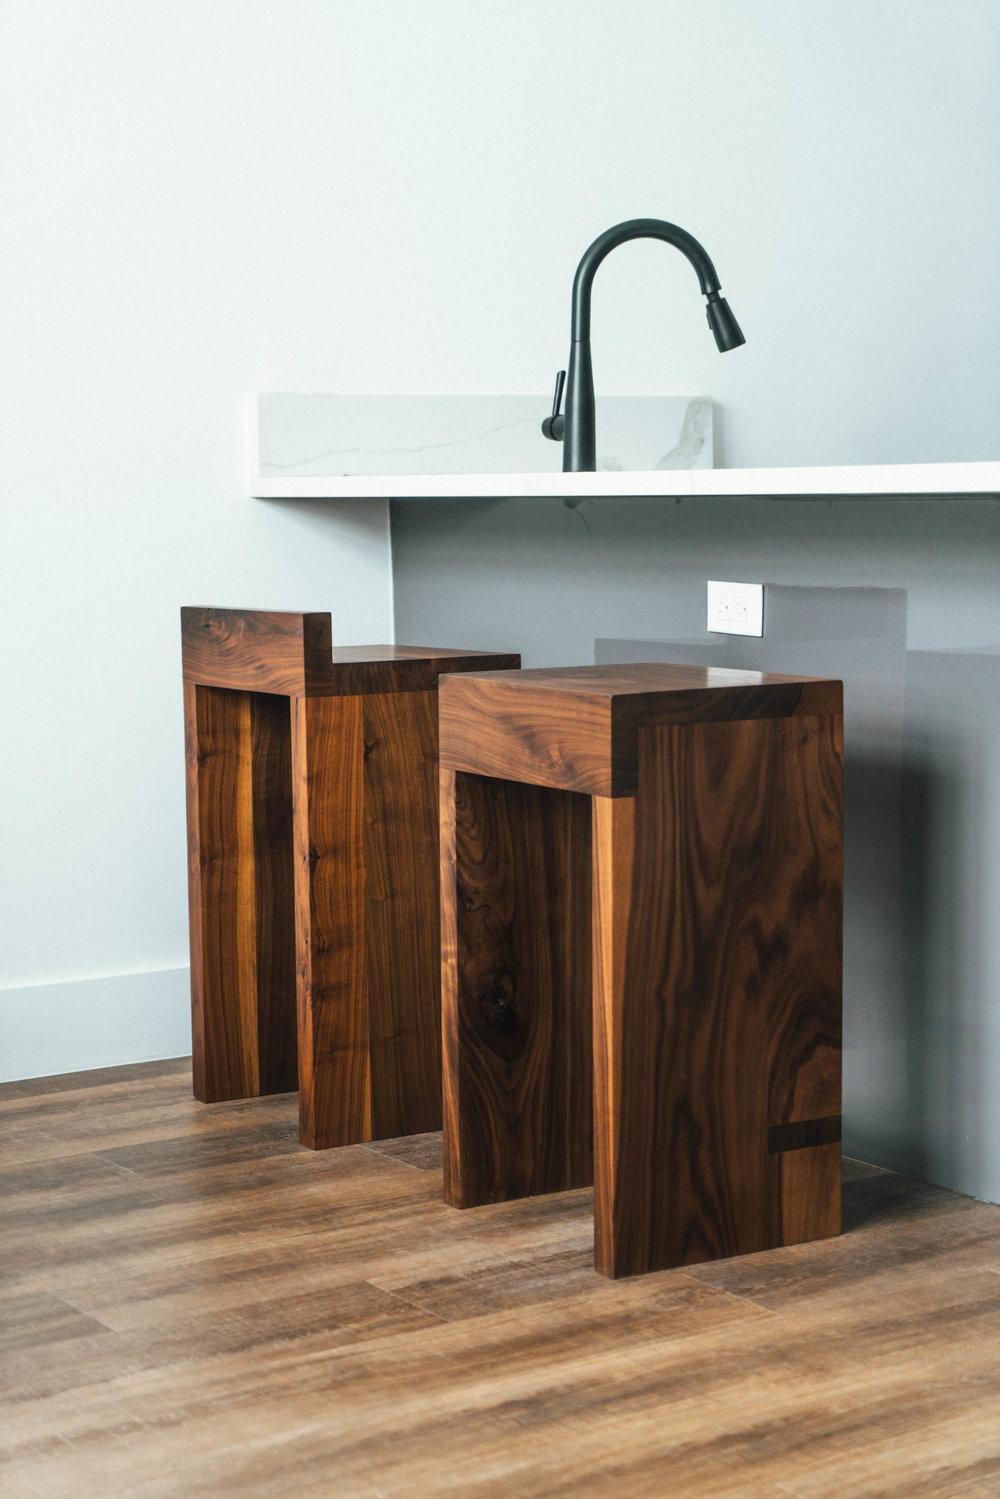 stools1-s.jpg